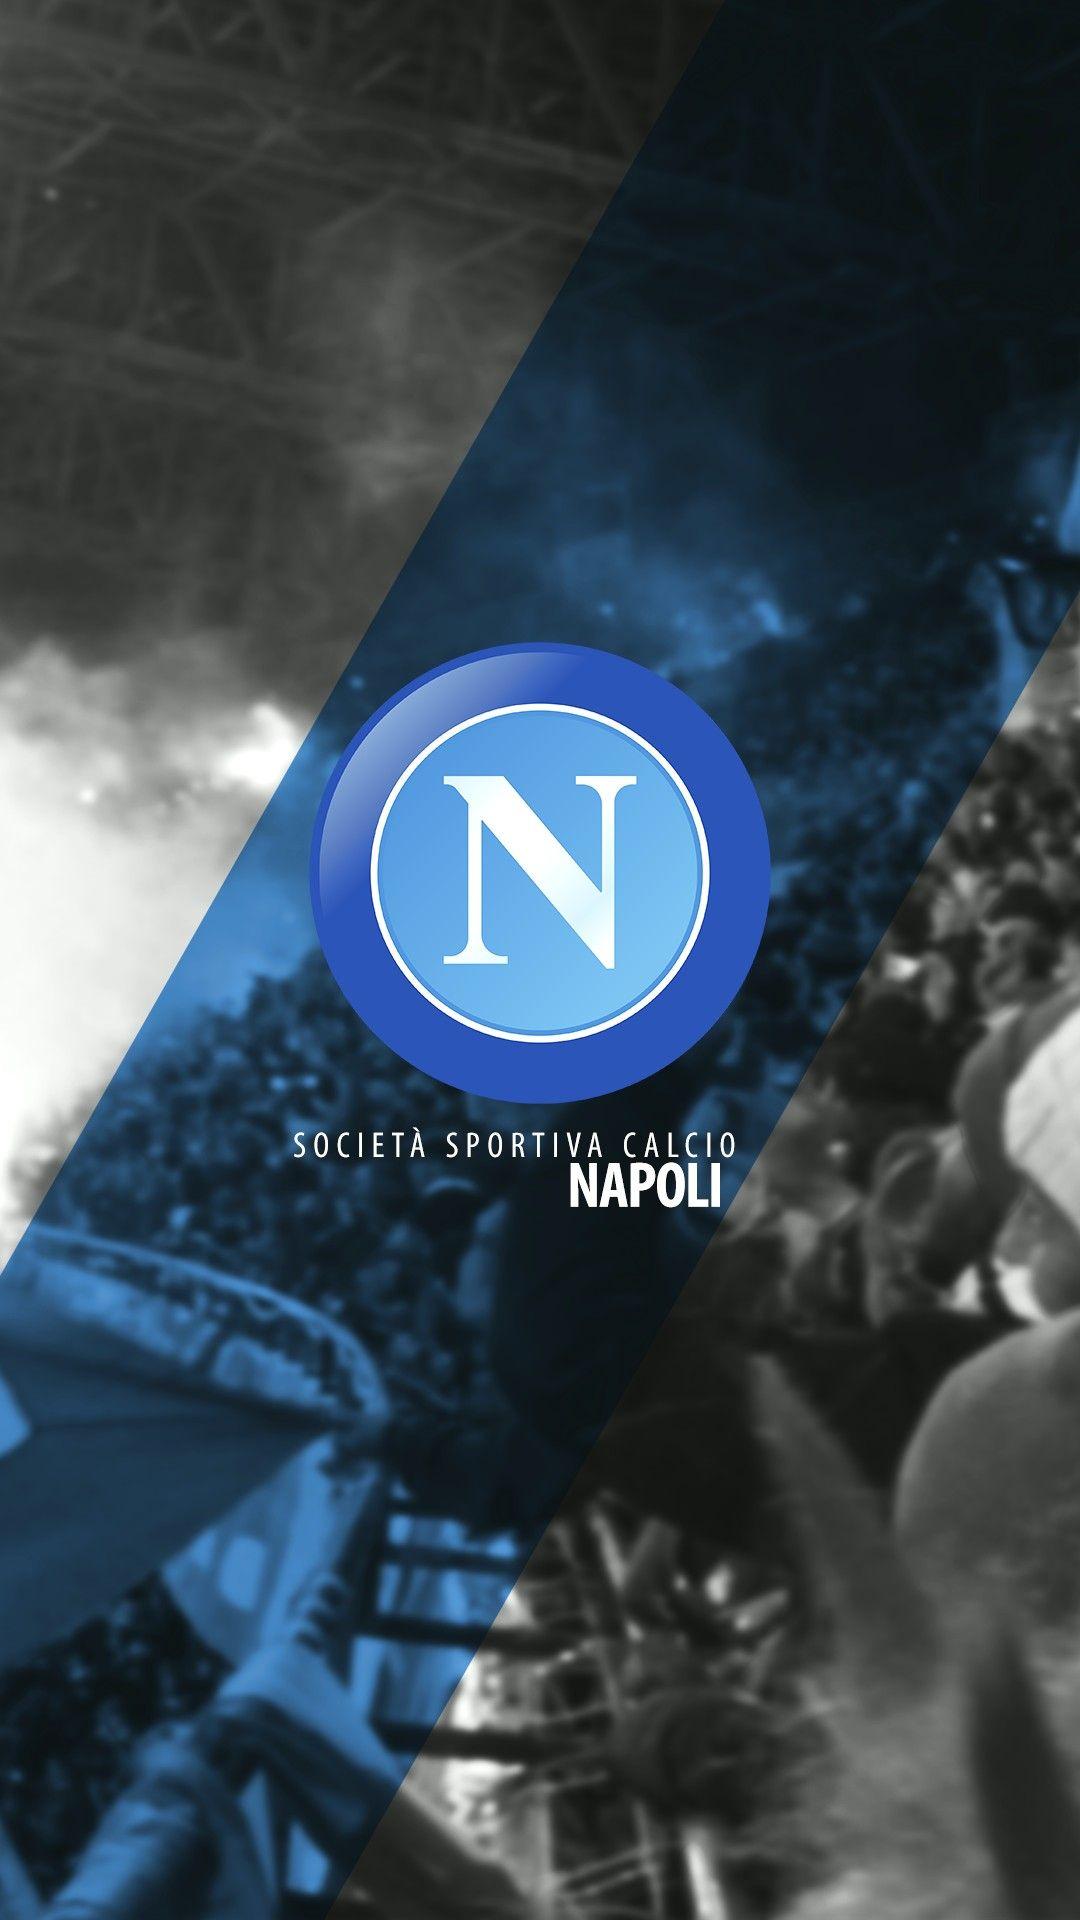 Pin on Napoli